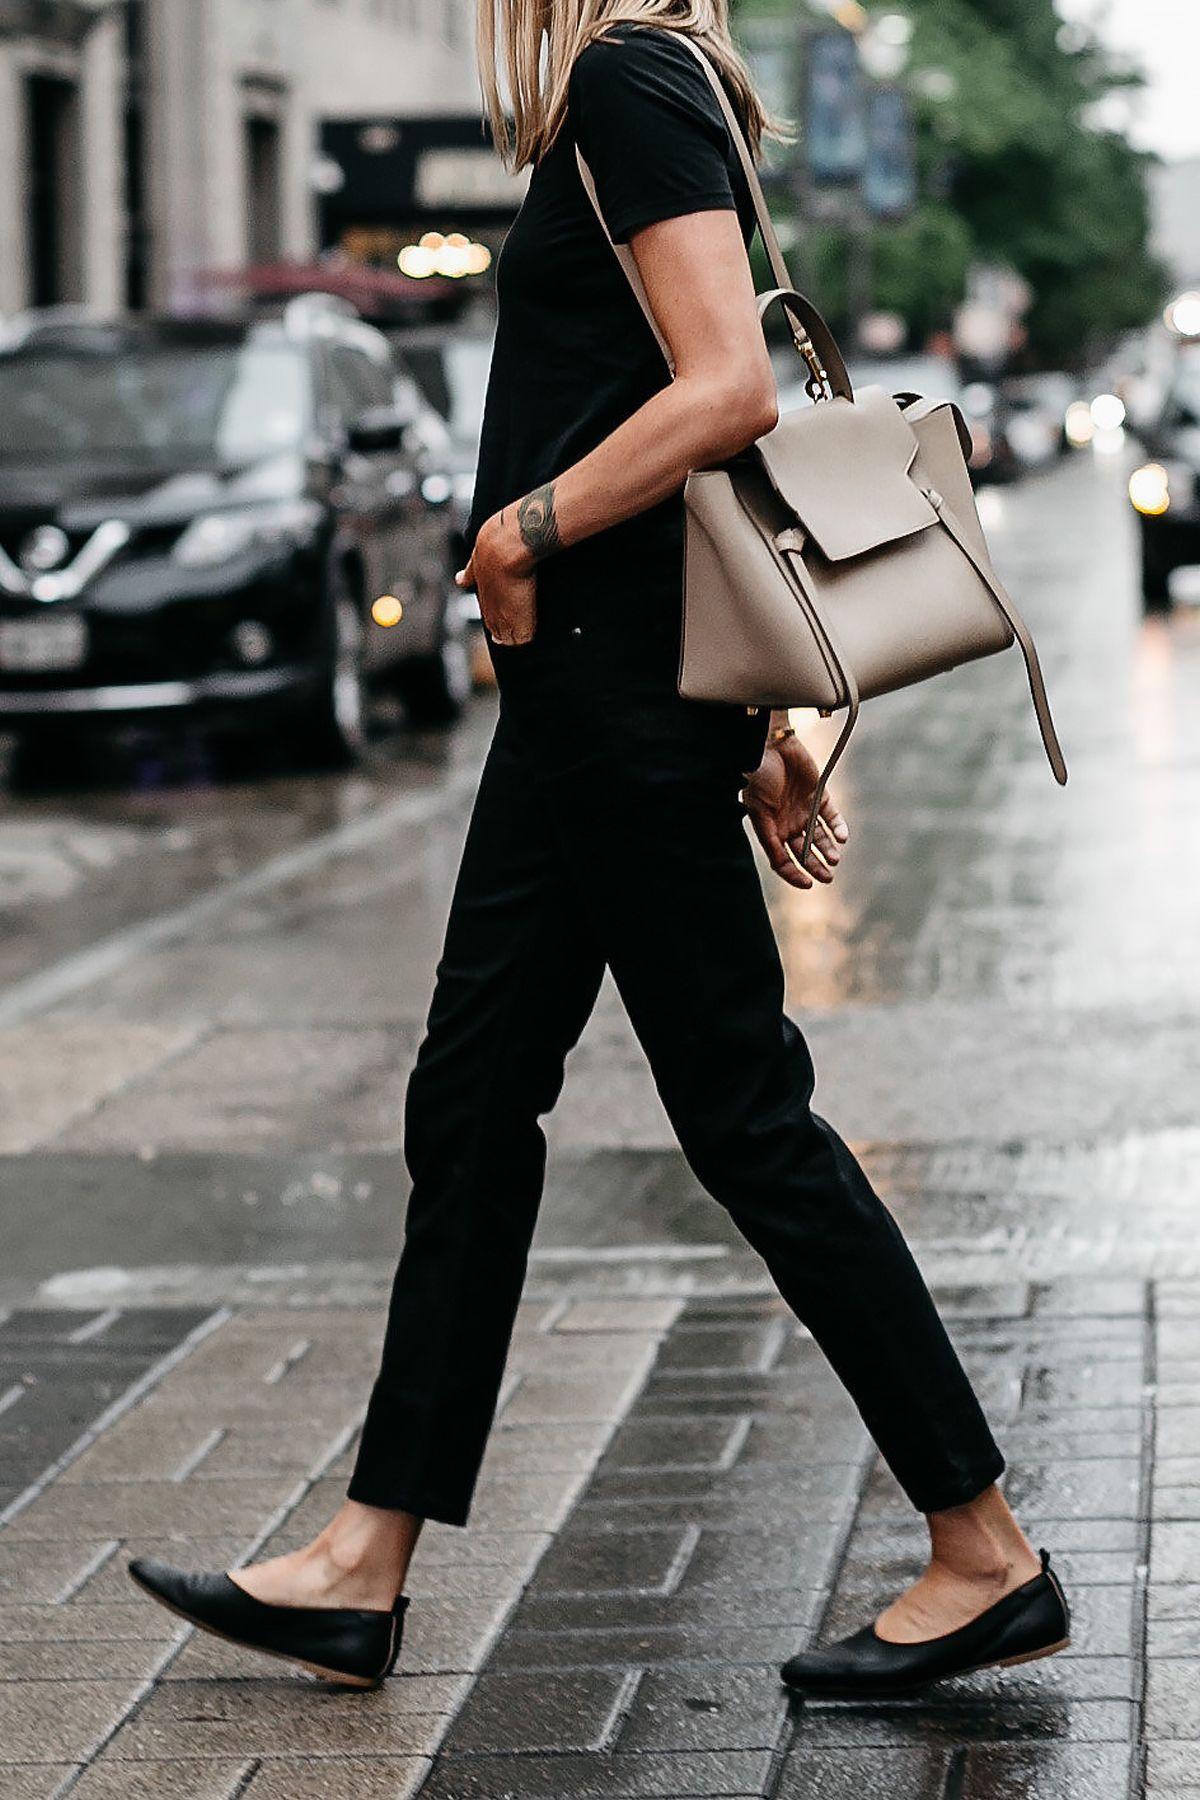 Woman Wearing Everlane Black Tshirt Everlane Black Boyfriend Jeans Everlane  Black Day Glove Flats Celine Mini Belt Bag Fashion Jackson Dallas Blogger  ... fc337581b04e3